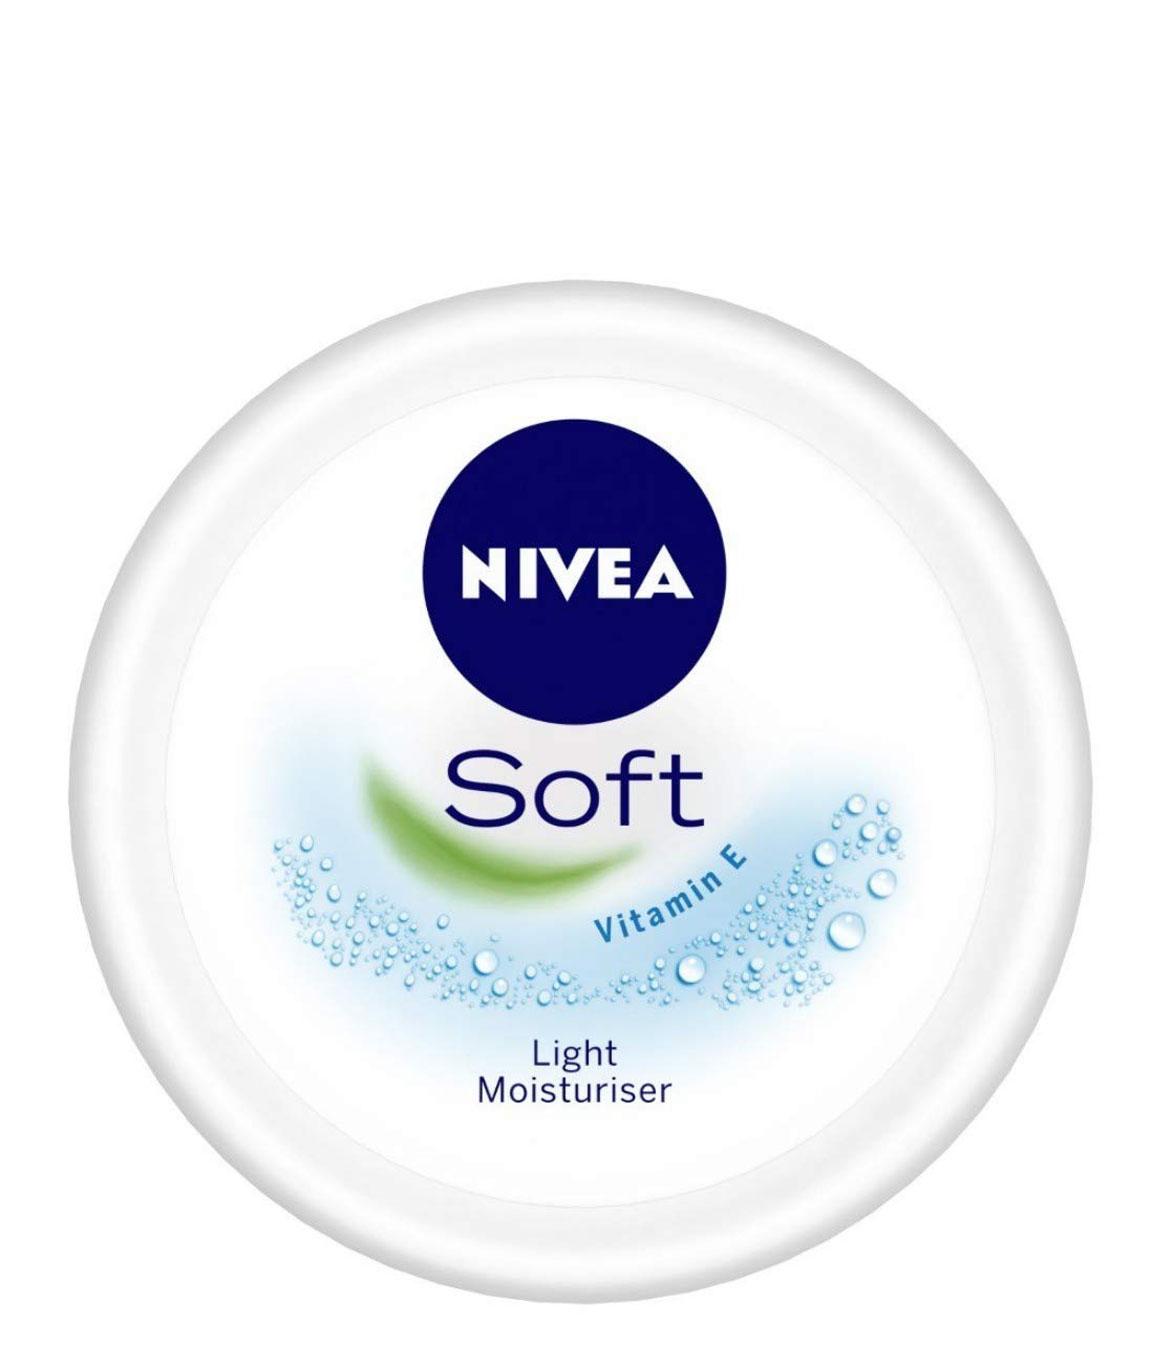 NIVEA Soft, Light Moisturising Cream, 300m